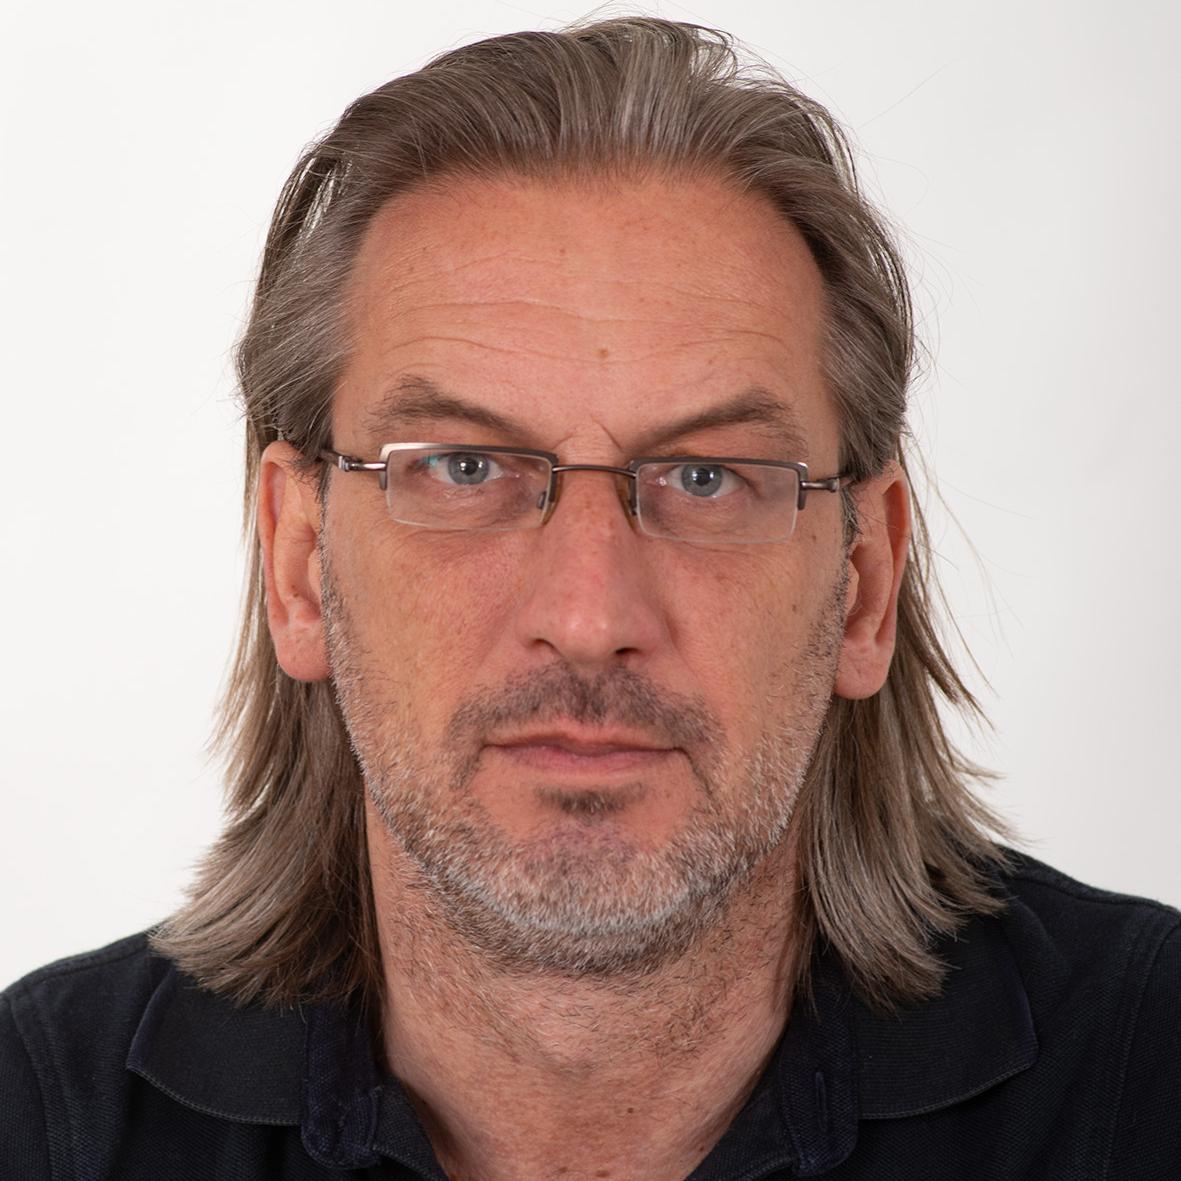 Gerfried Drube